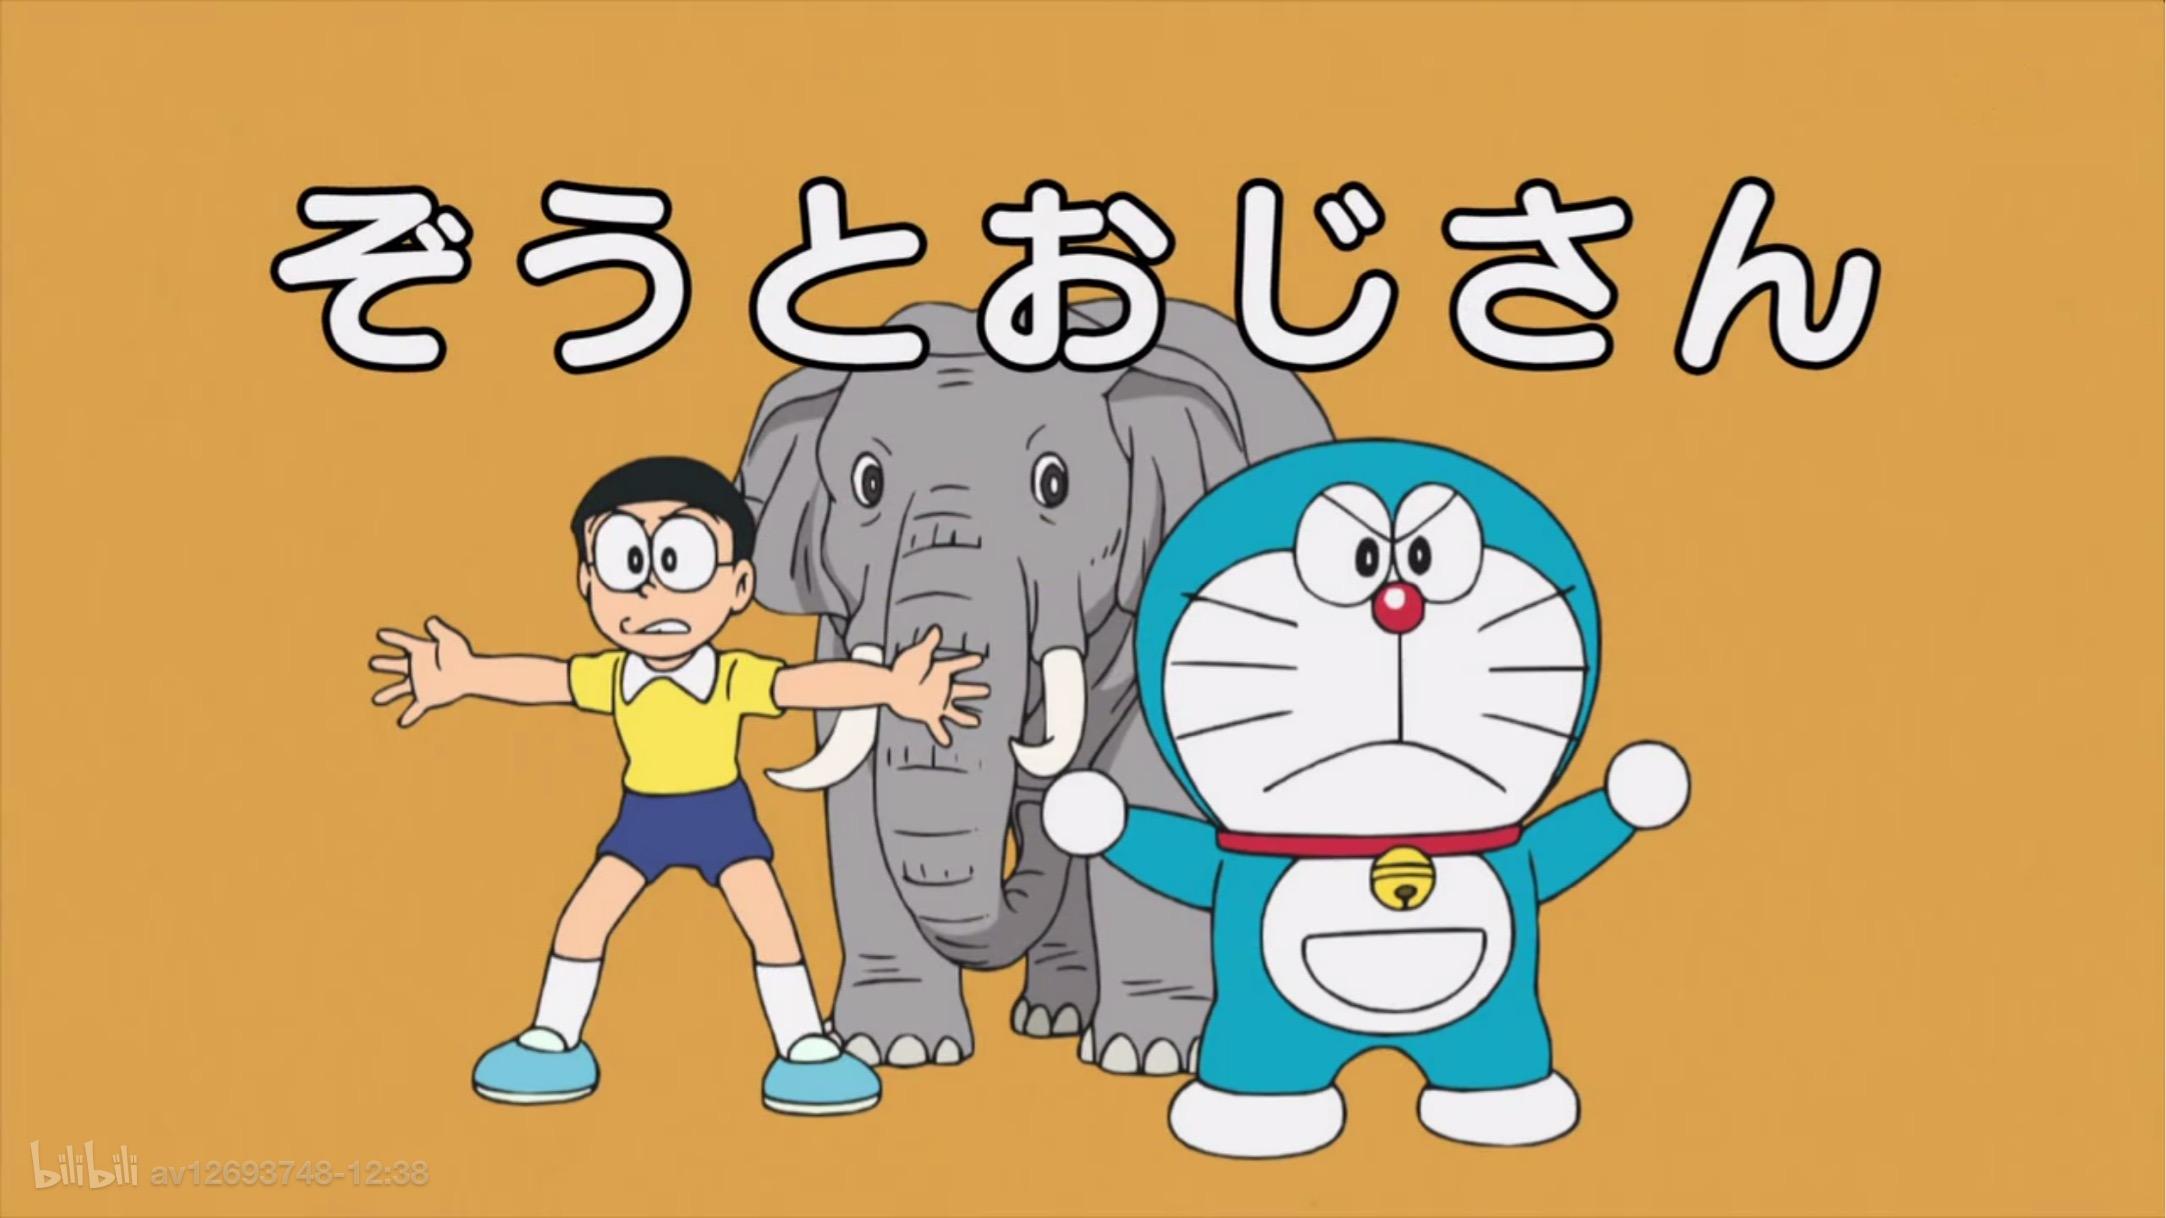 大象与叔叔